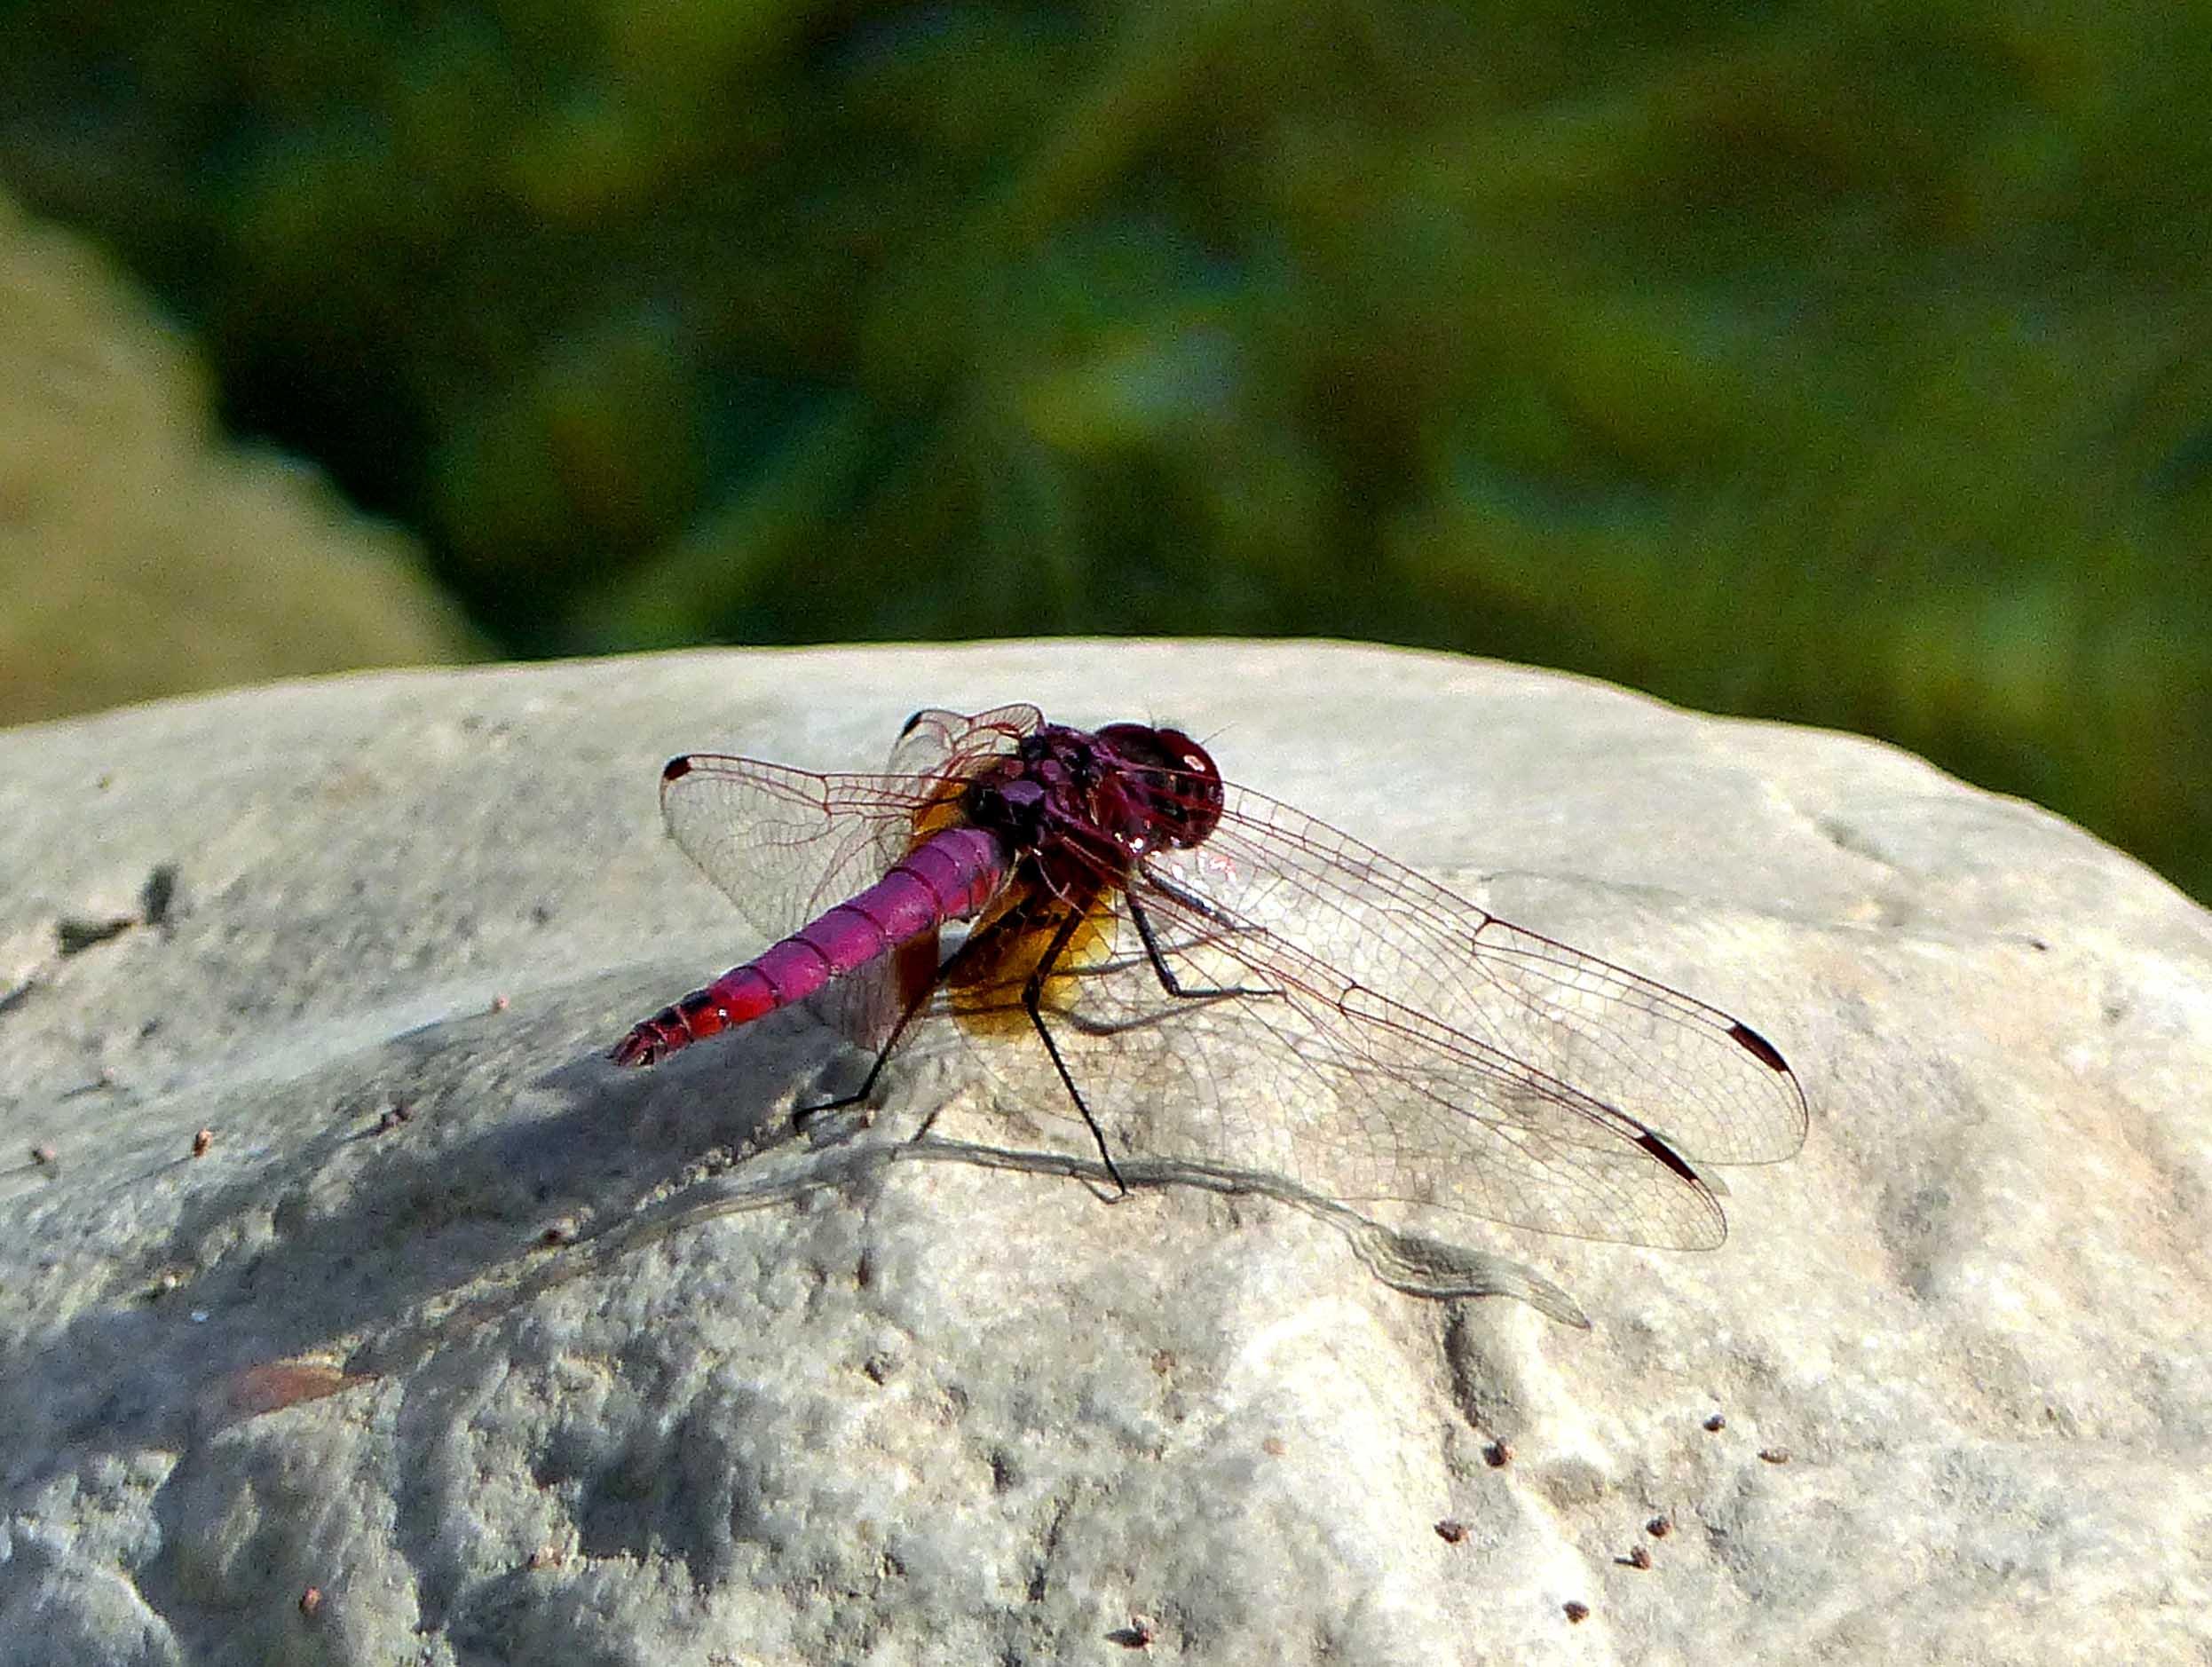 Mauve dragonfly on a rock